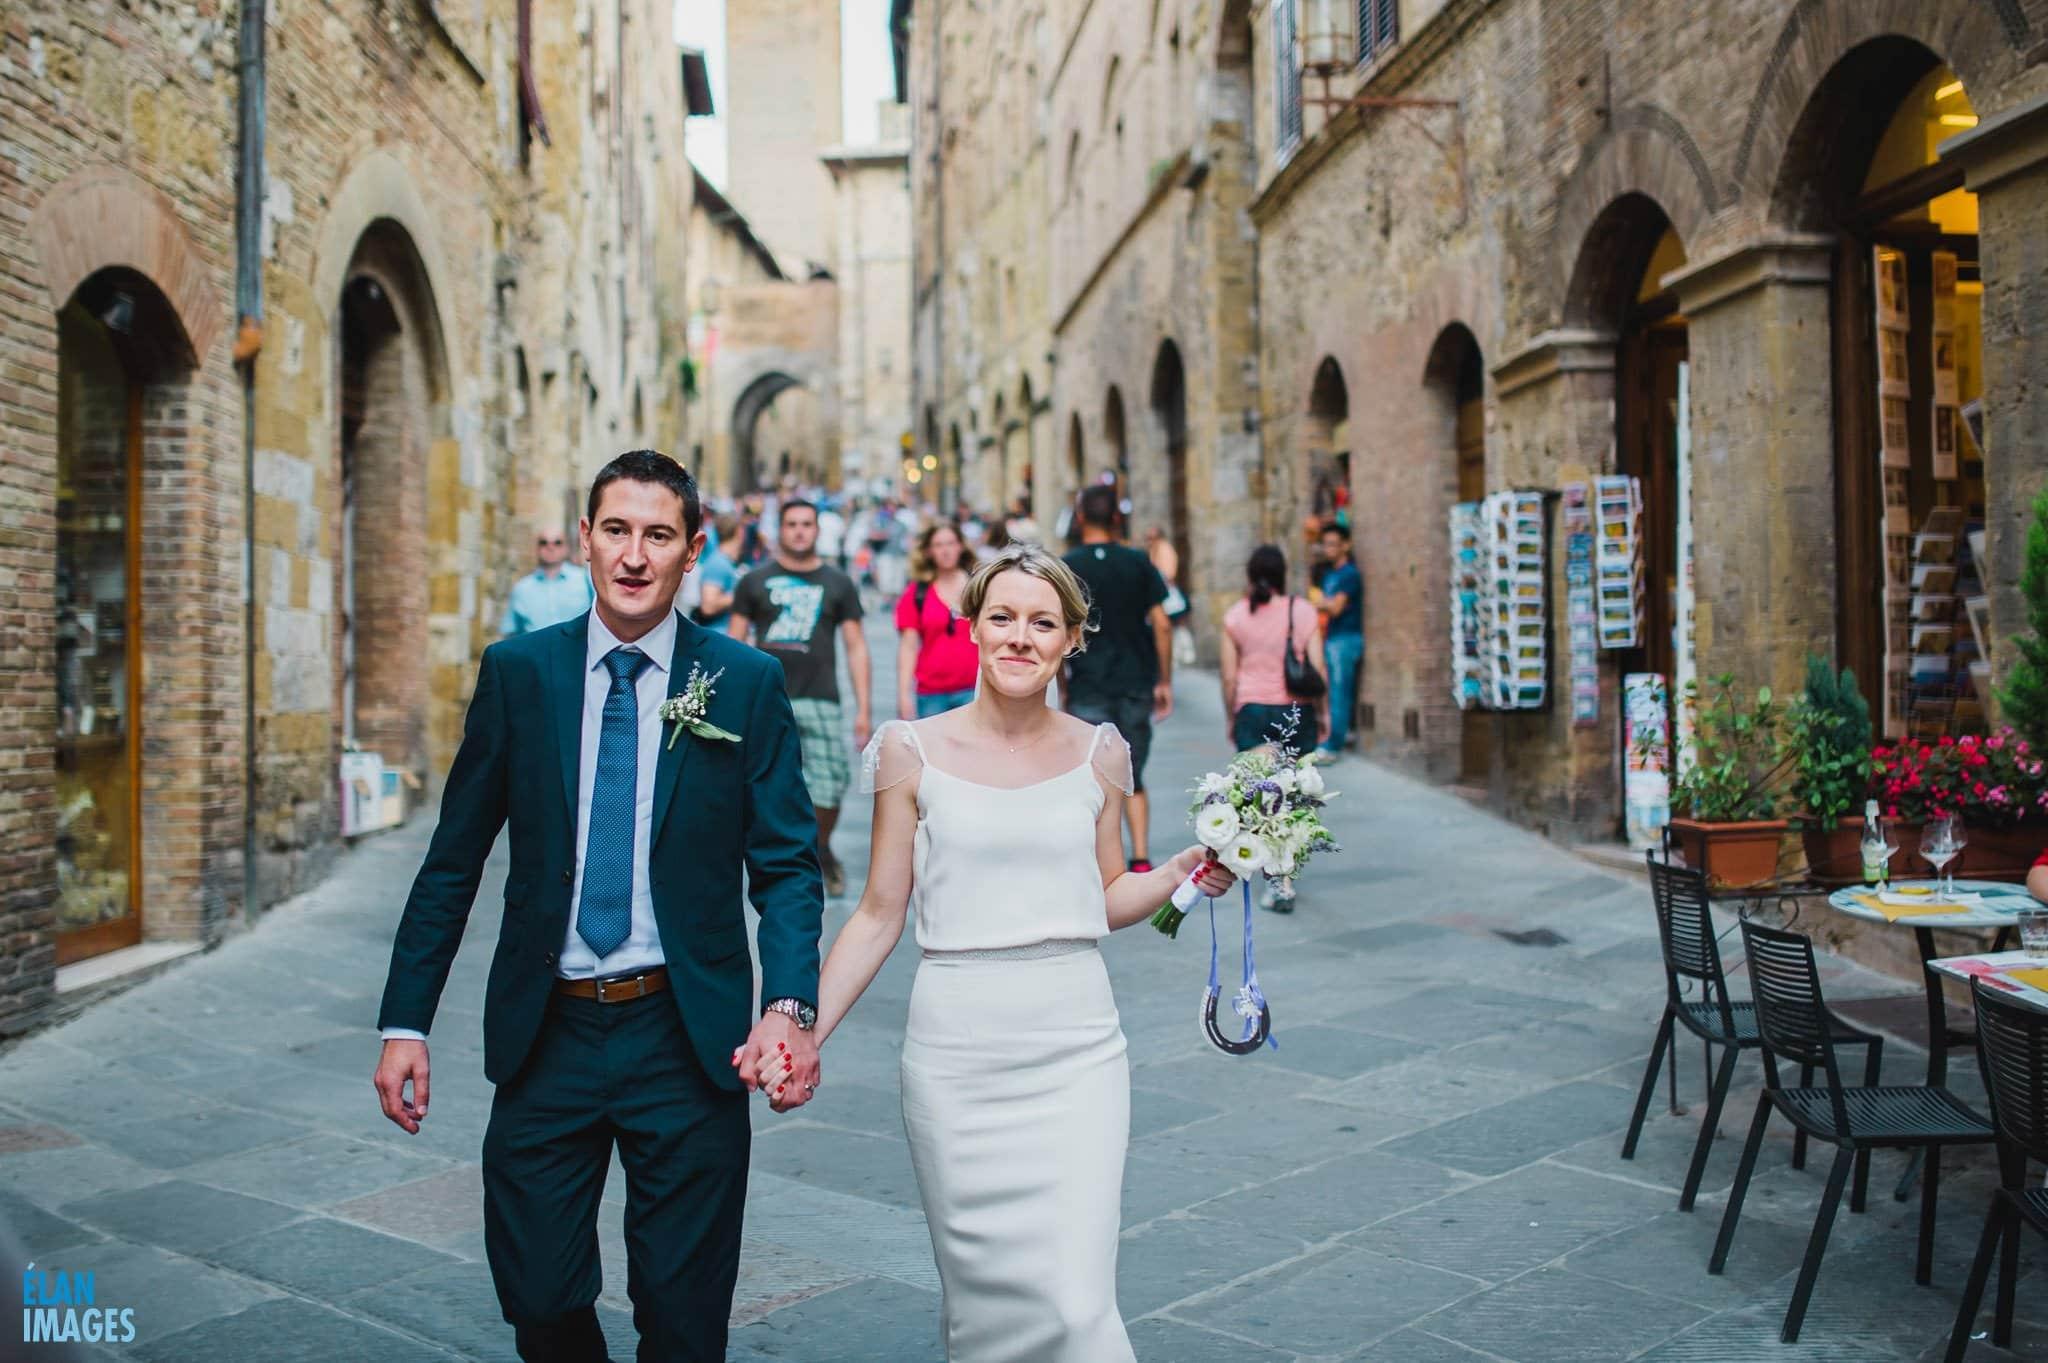 San Gimignano Wedding in Italy 66